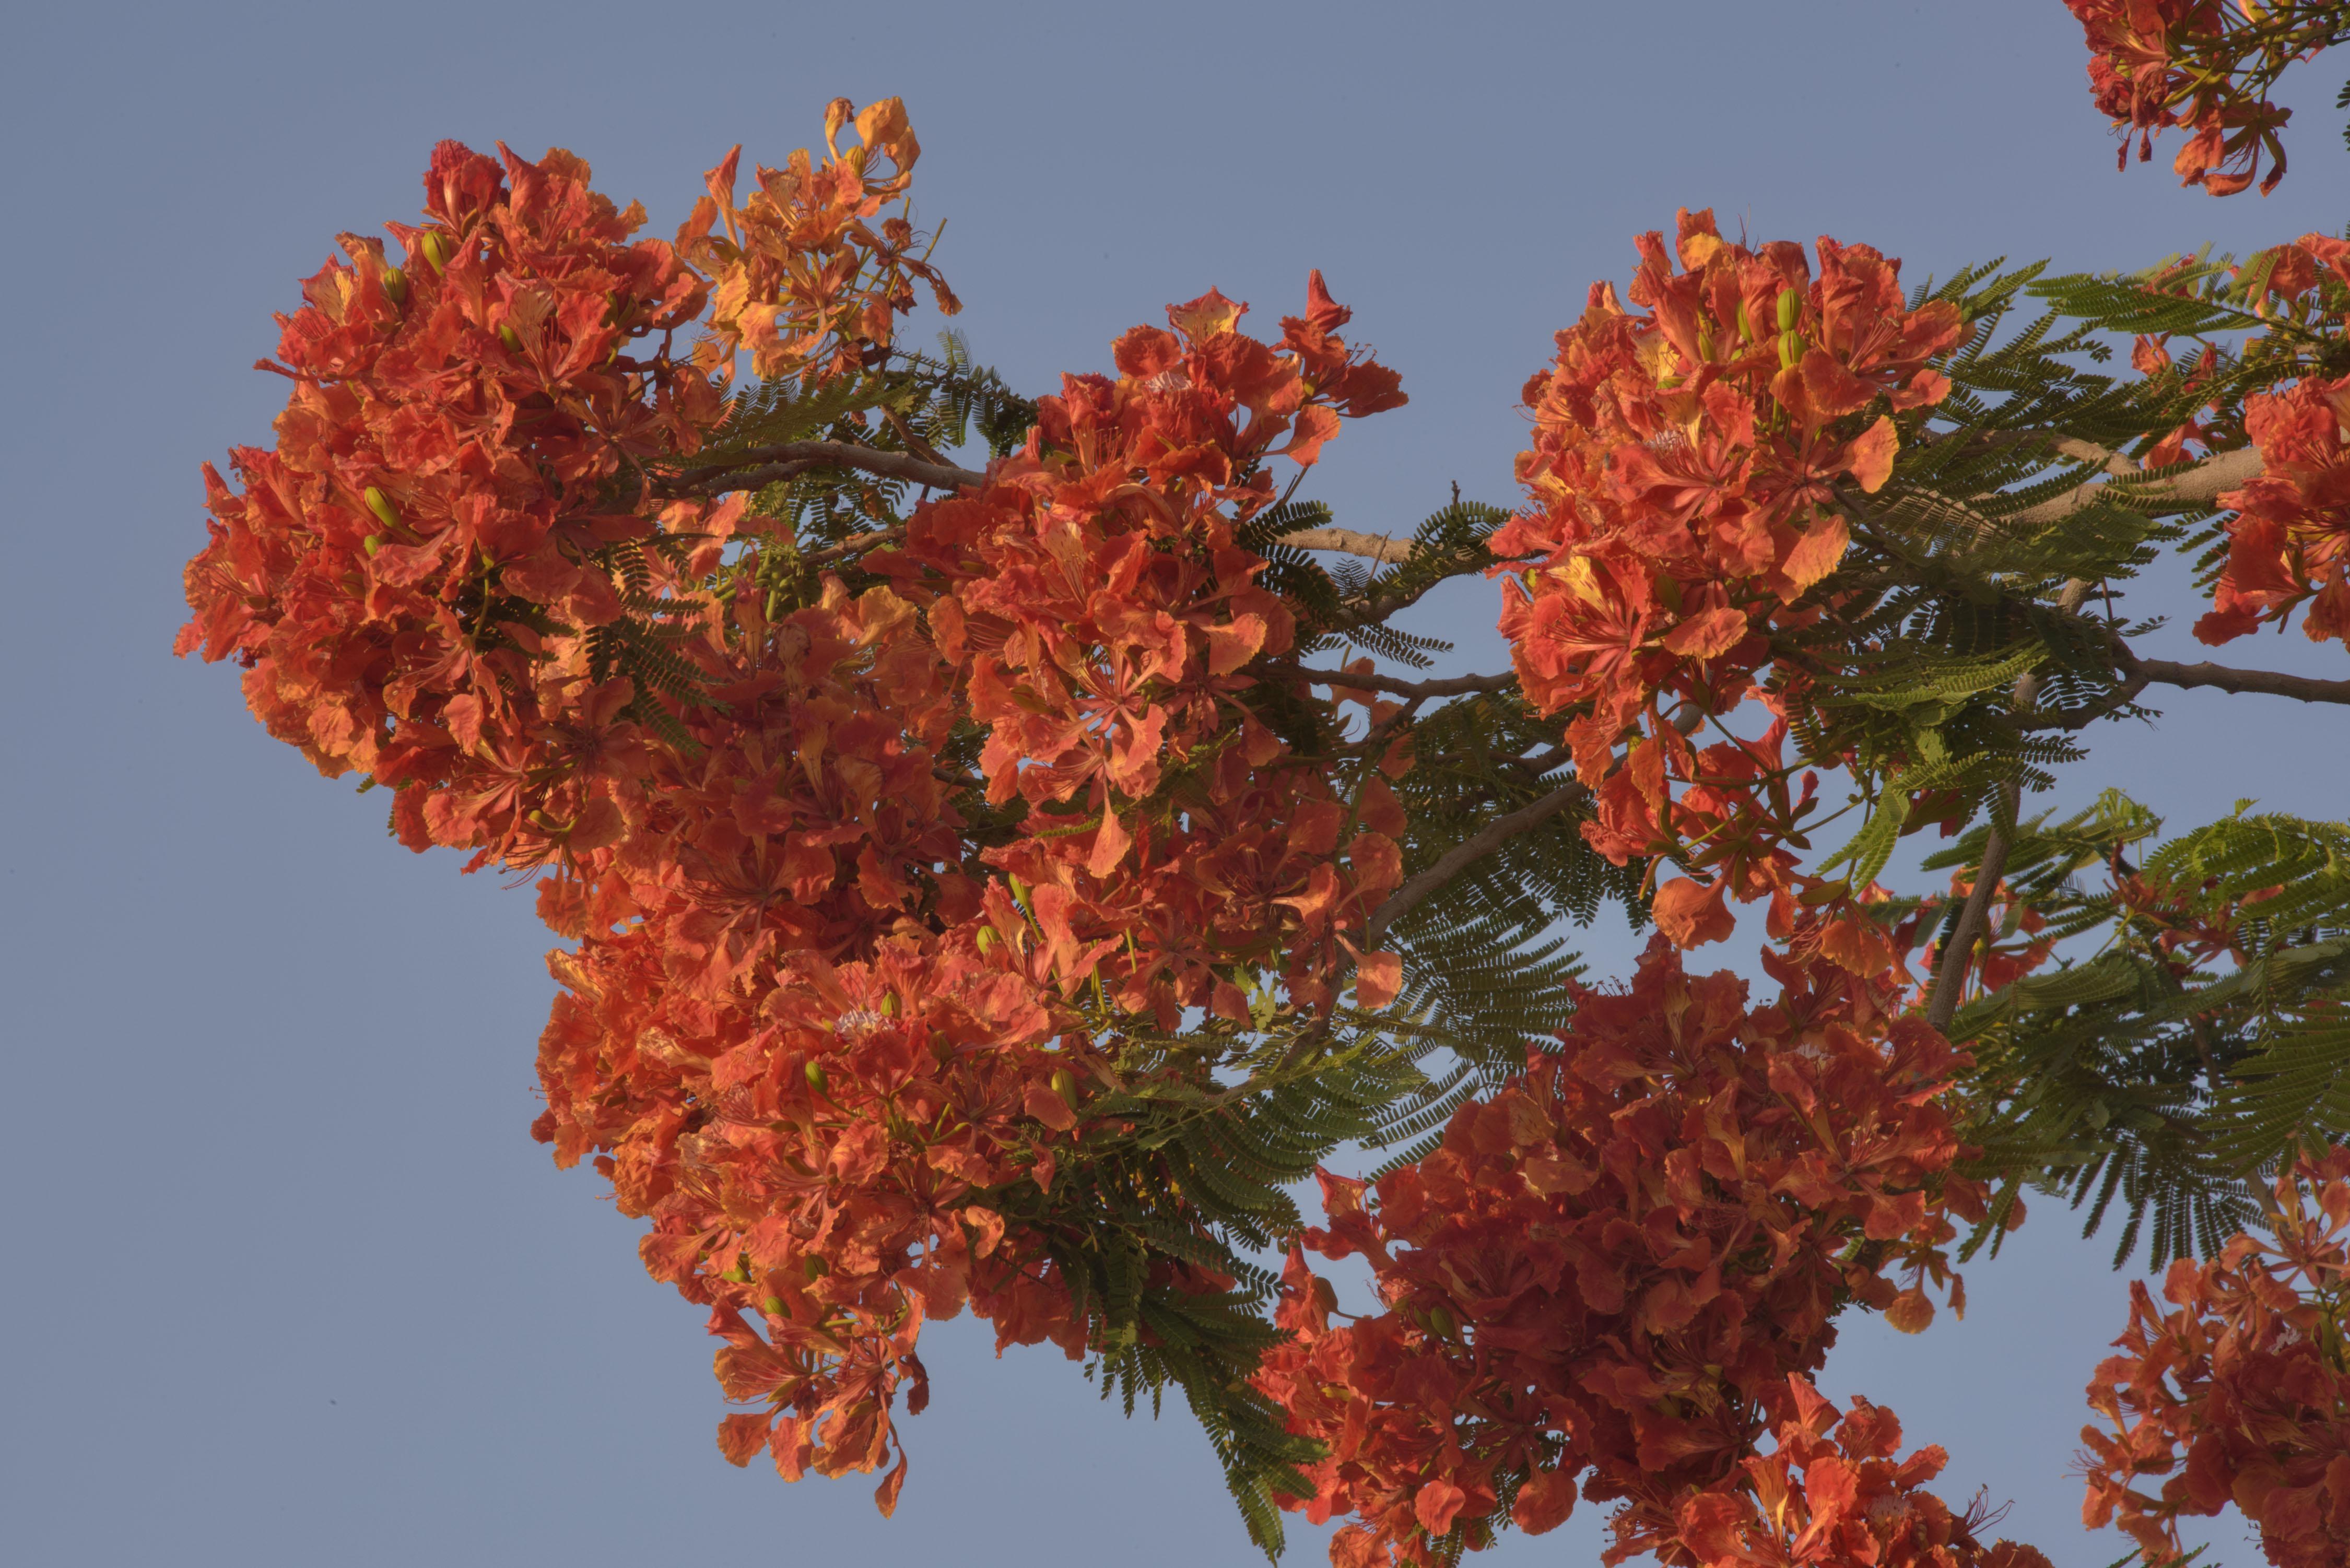 Magnificent Doha Abu Samra Blooming Royal Poinciana Tree Flamboyant Royal Poinciana Tree Care Royal Poinciana Tree California houzz 01 Royal Poinciana Tree